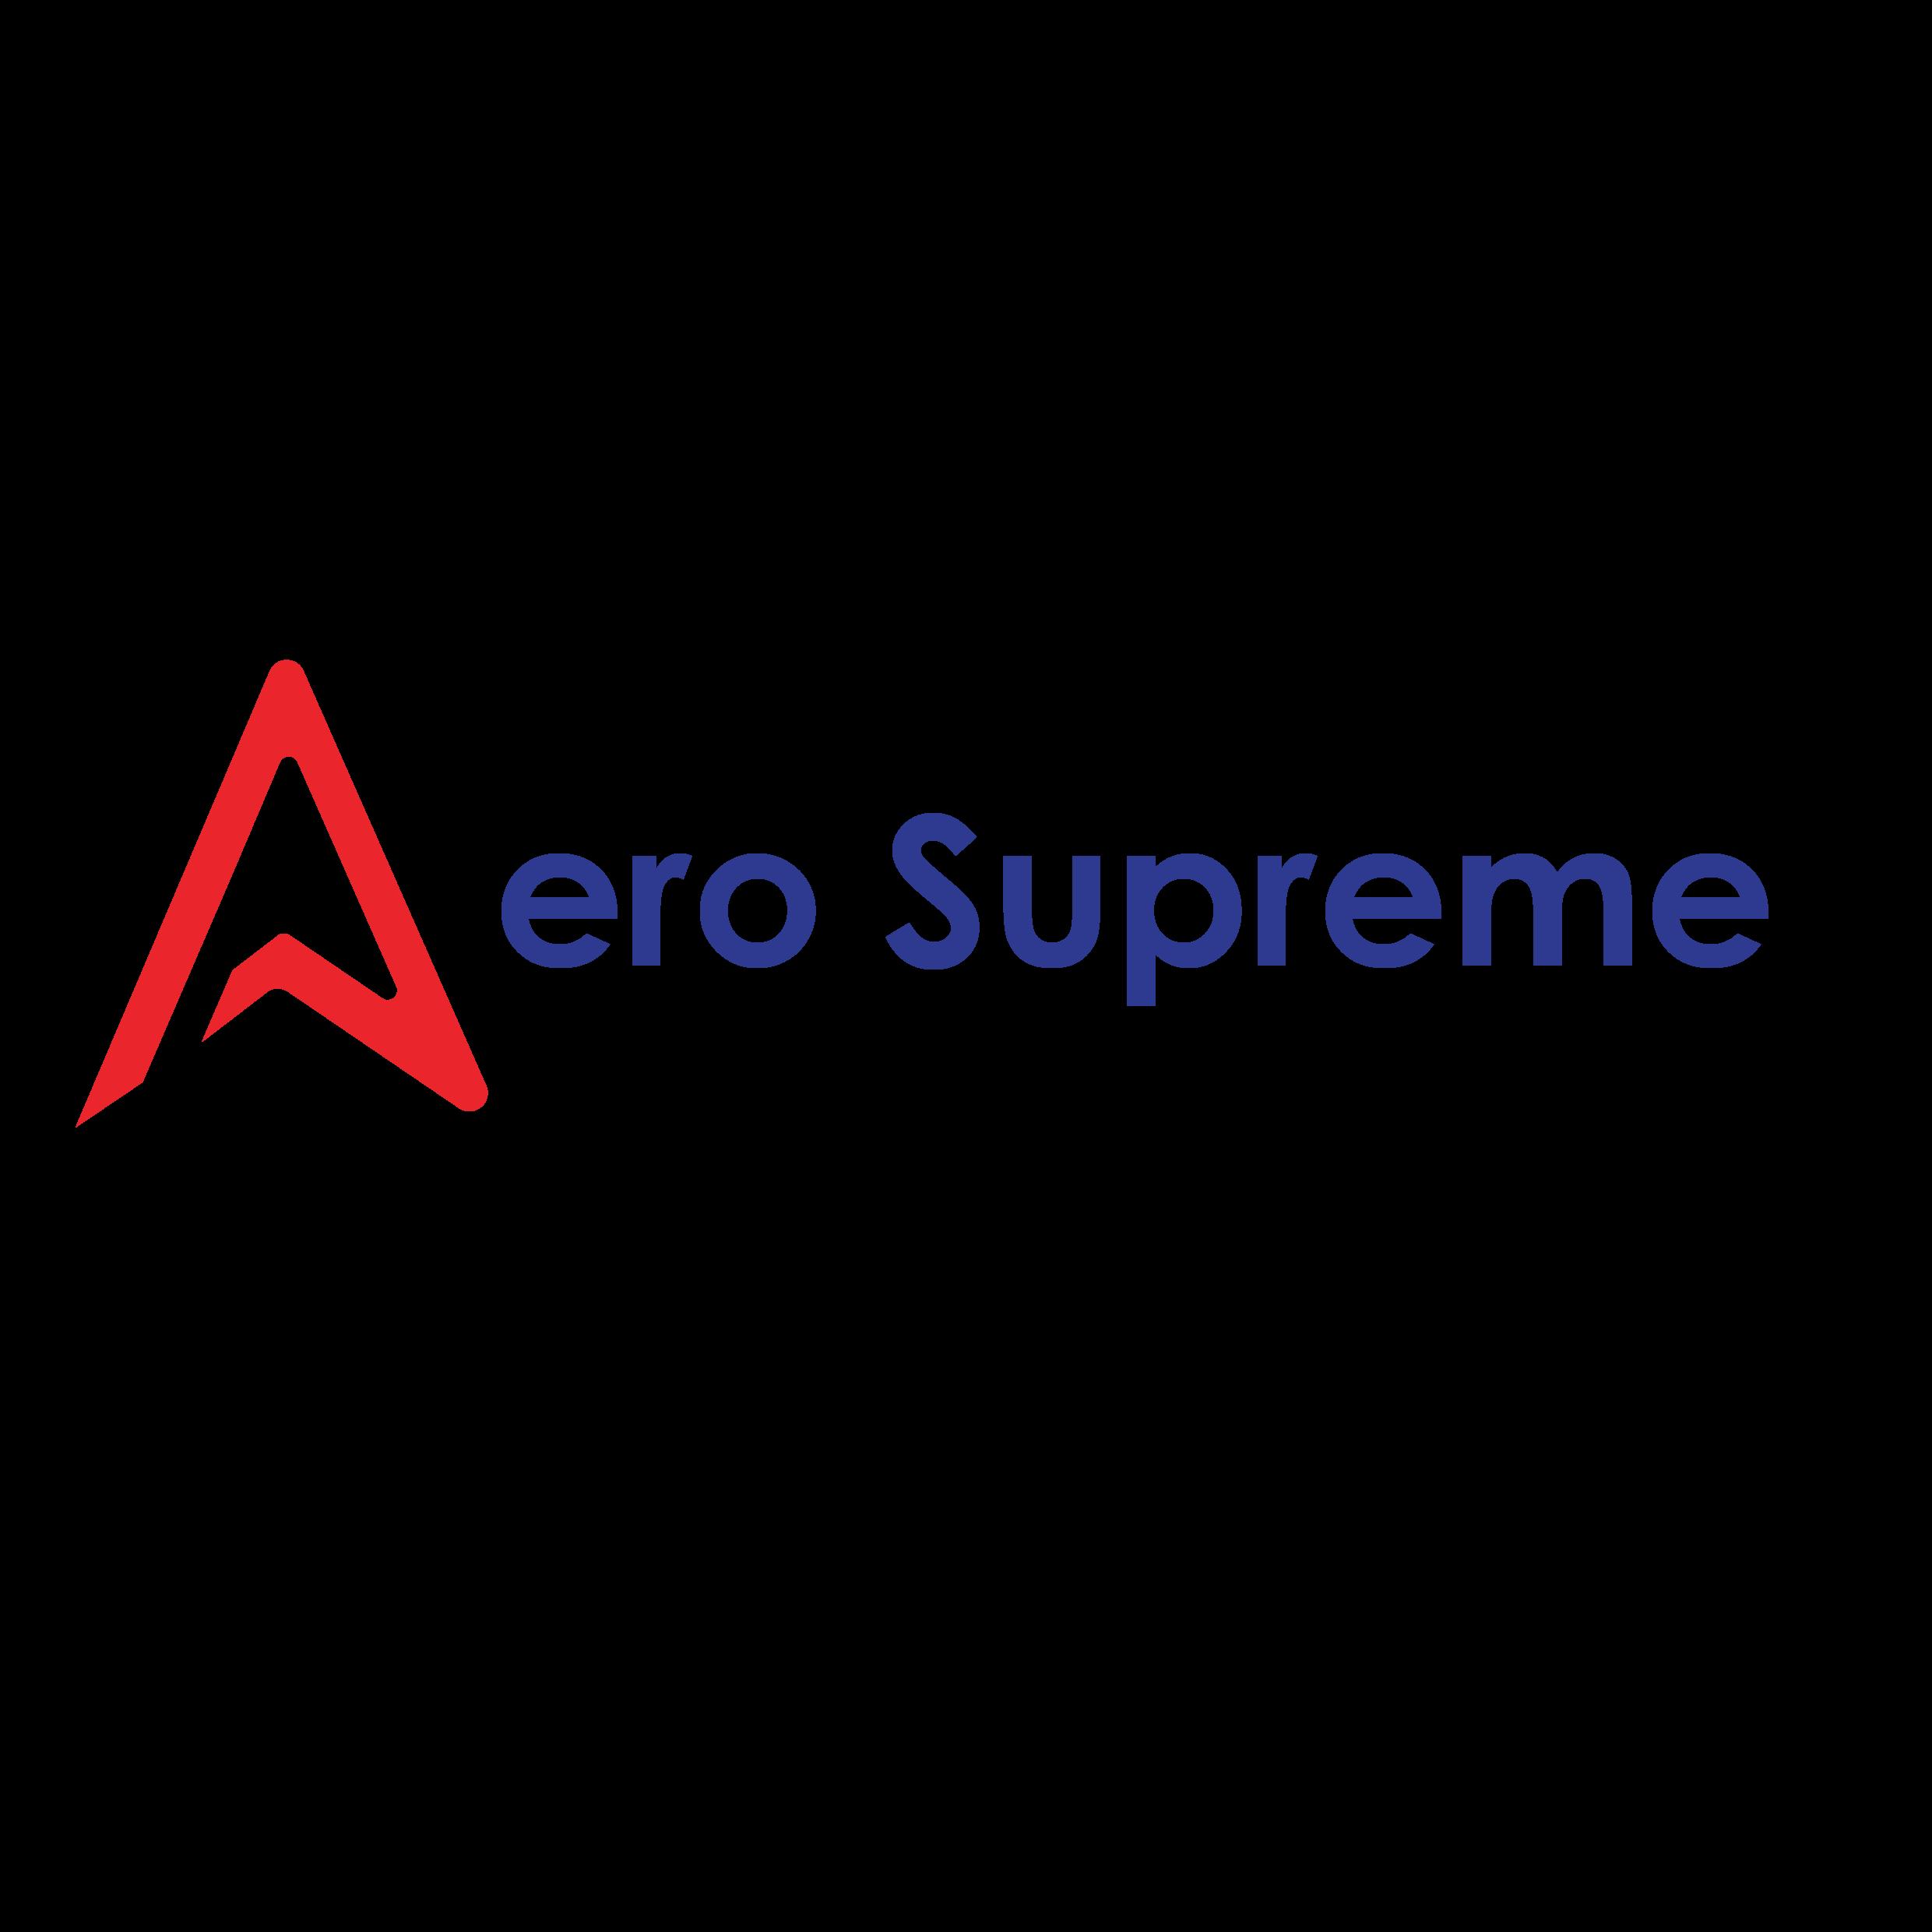 Logo of company Aero Supreme